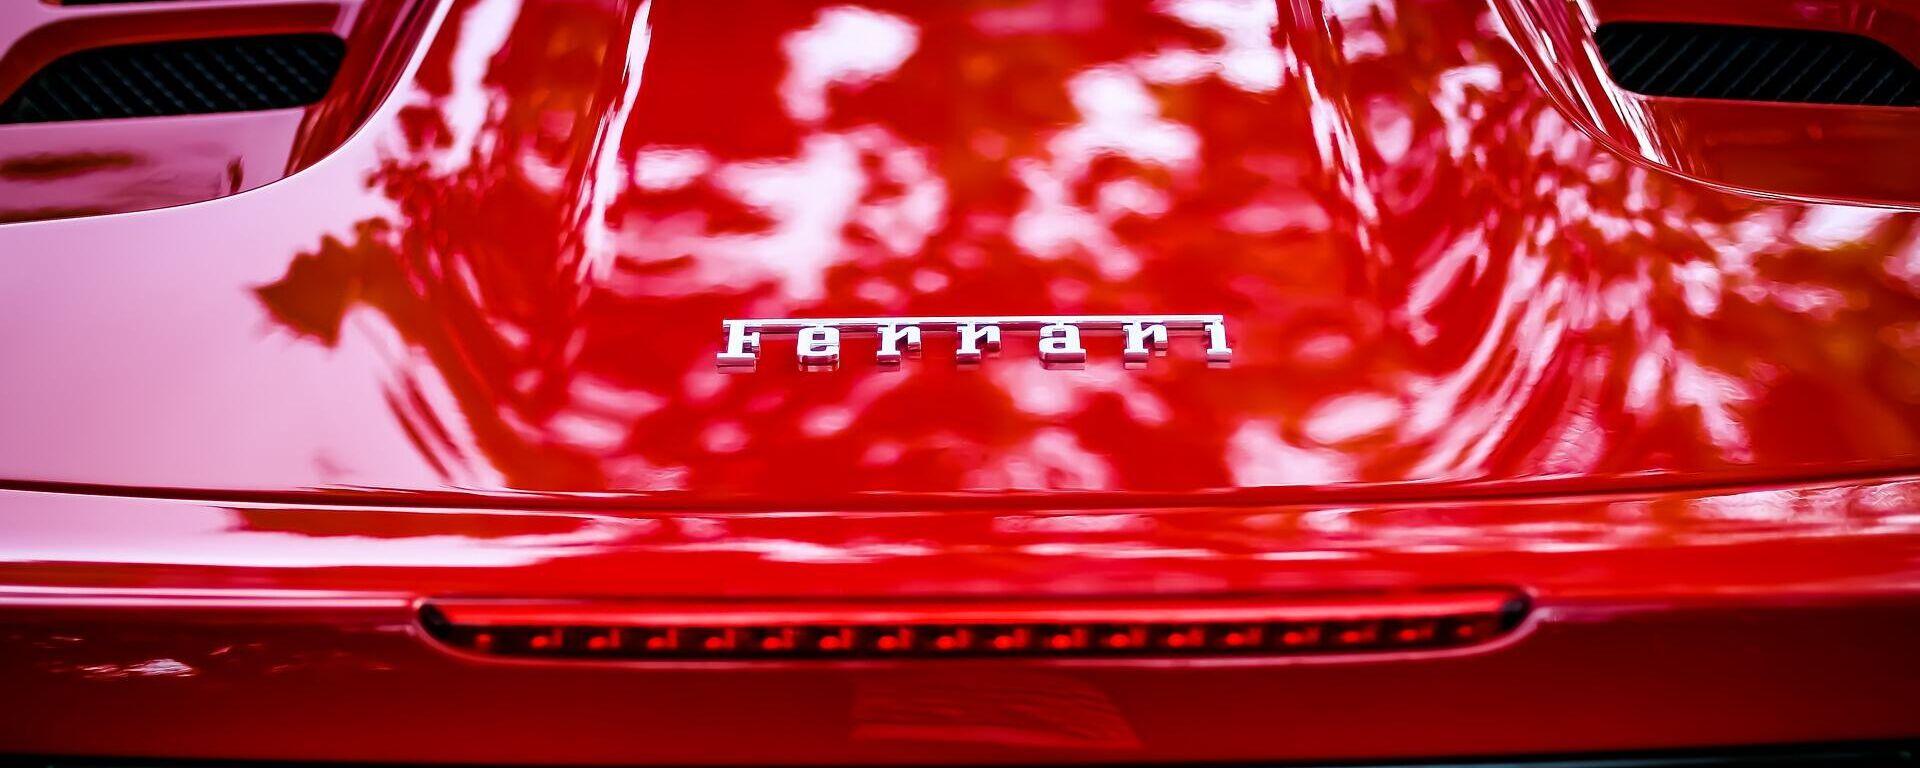 Ferrari (Symbolbild)  - SNA, 1920, 05.07.2021